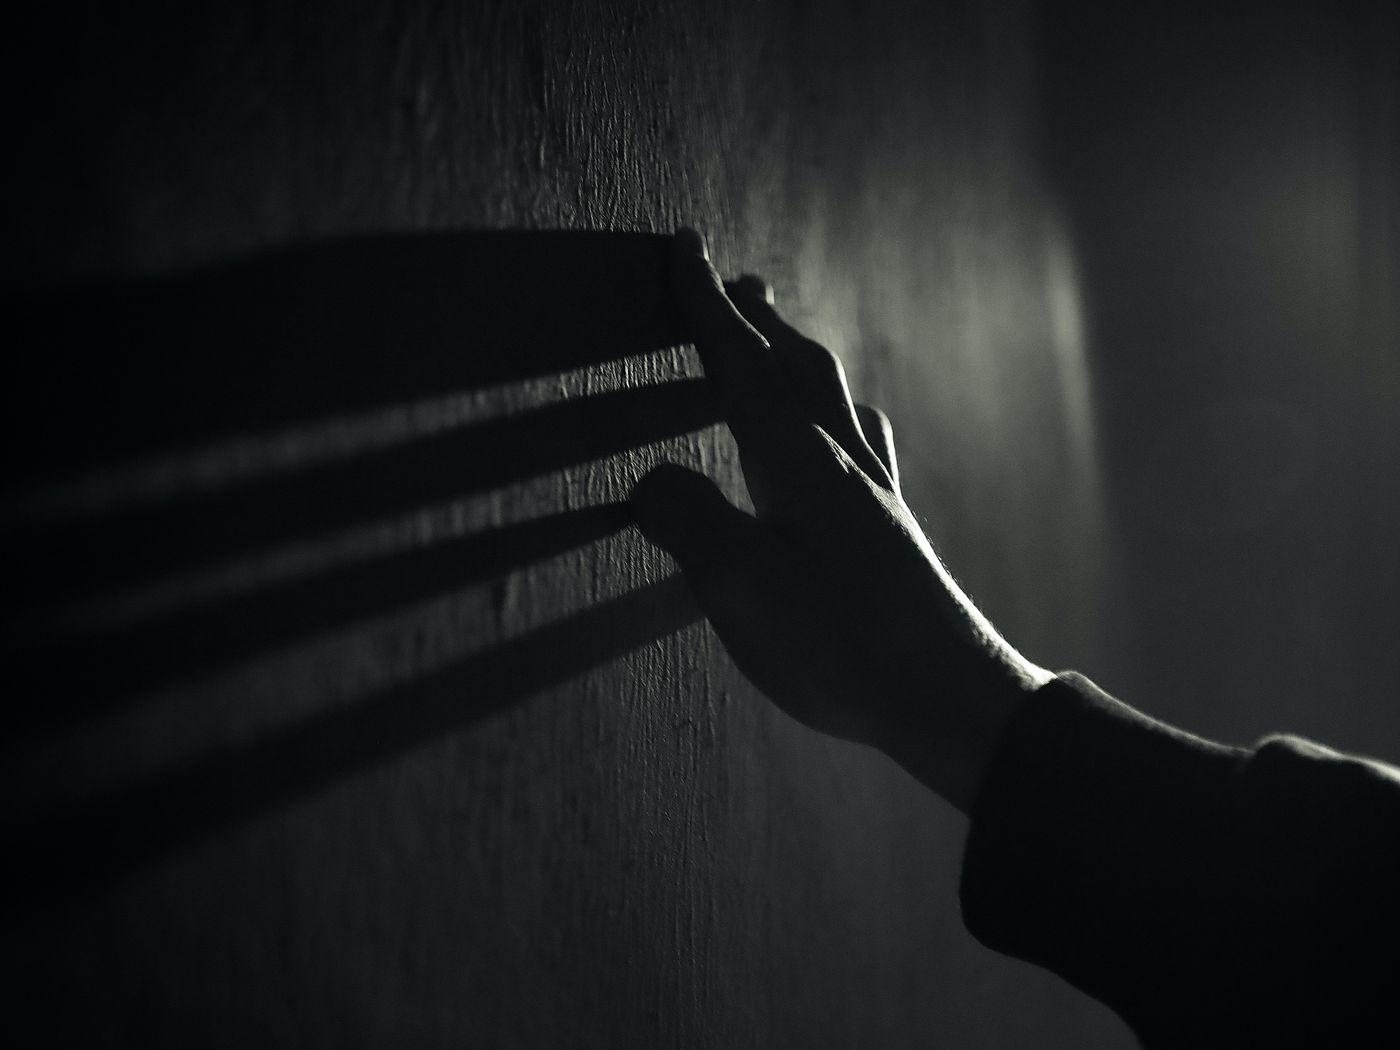 1400x1050 Wallpaper hand, wall, touch, bw, shadow, dark